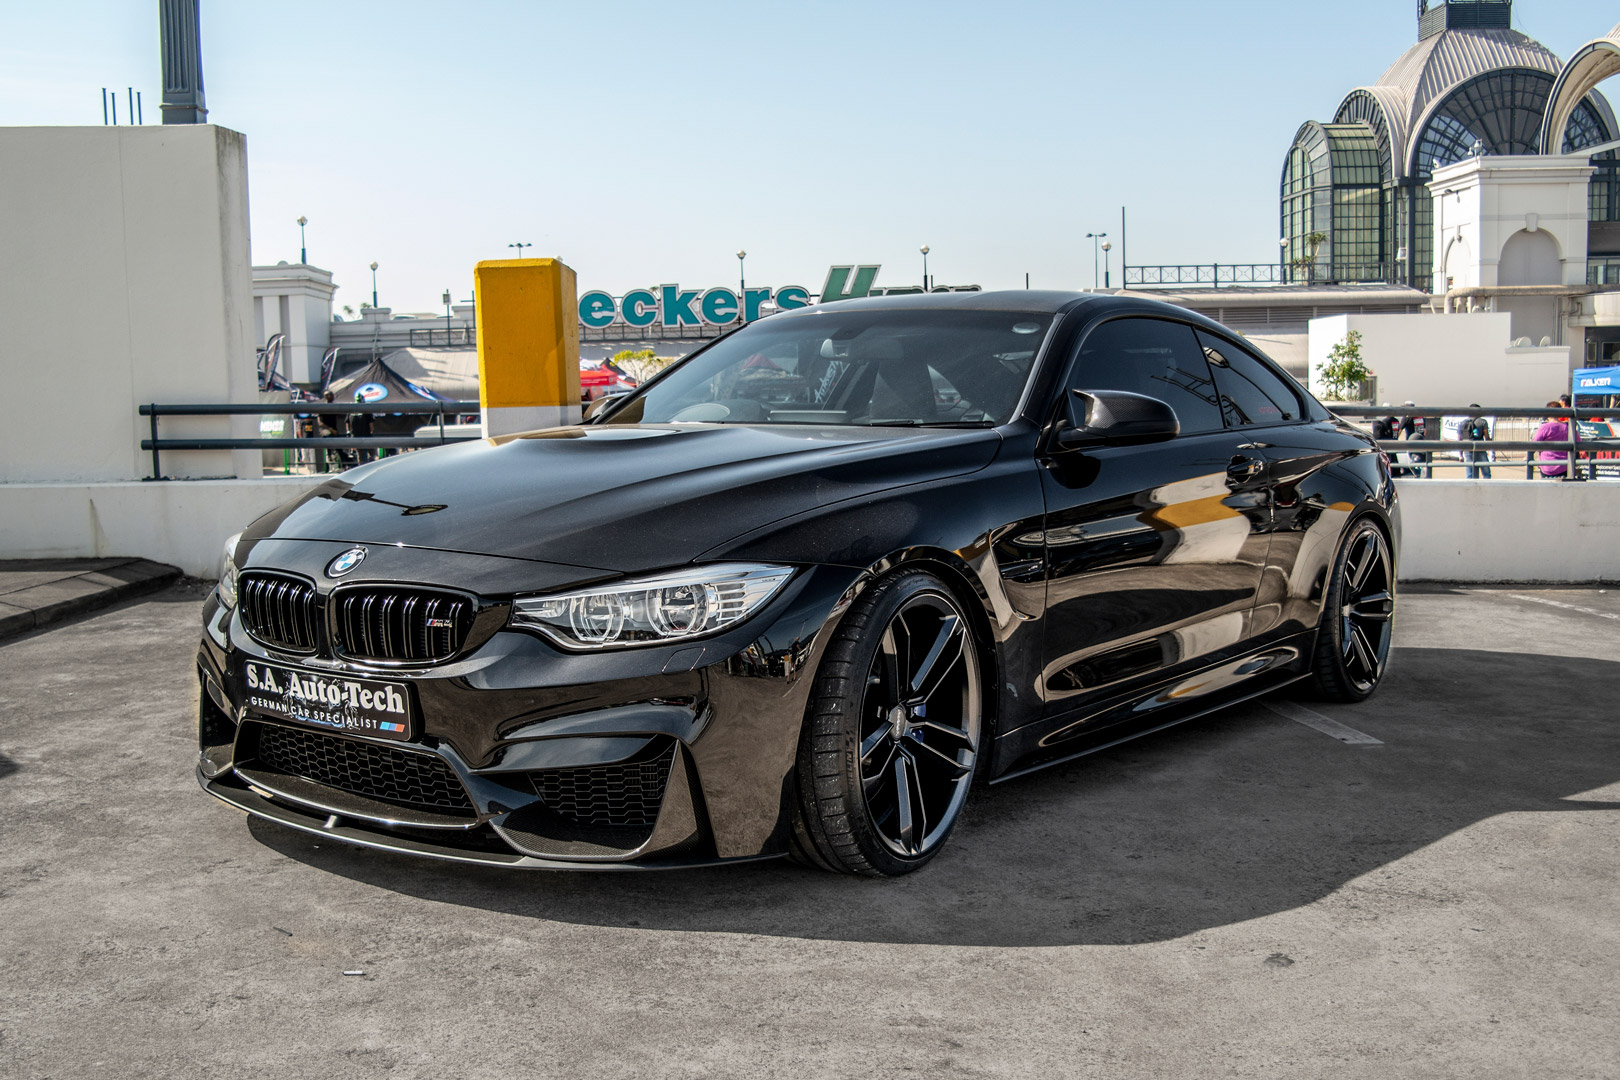 BMW M4 Black Rims Staggered Varro VD07 Wheels